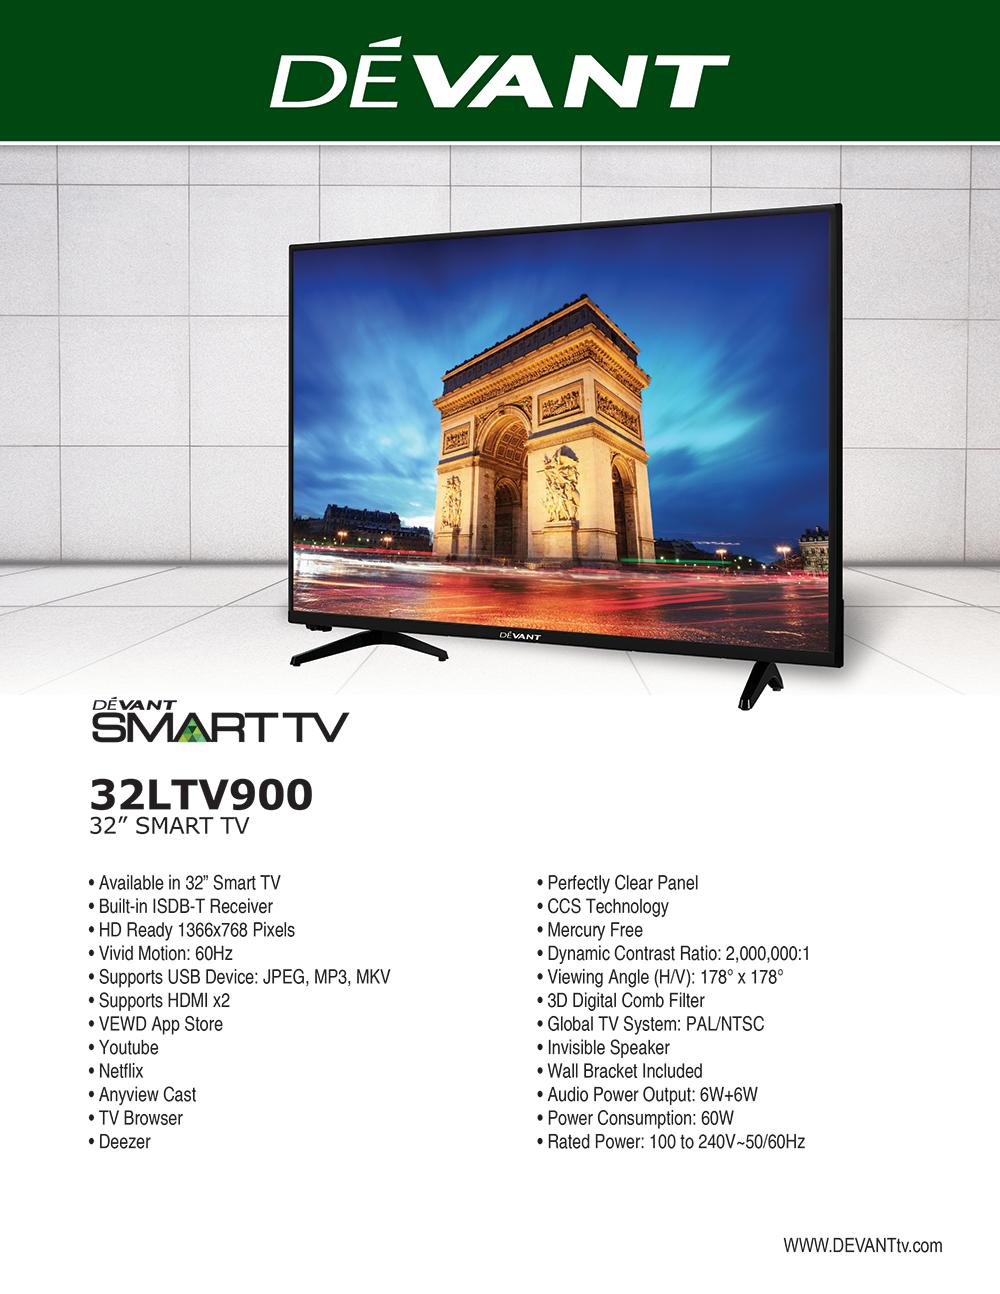 Devant 32LTV900 Smart Television